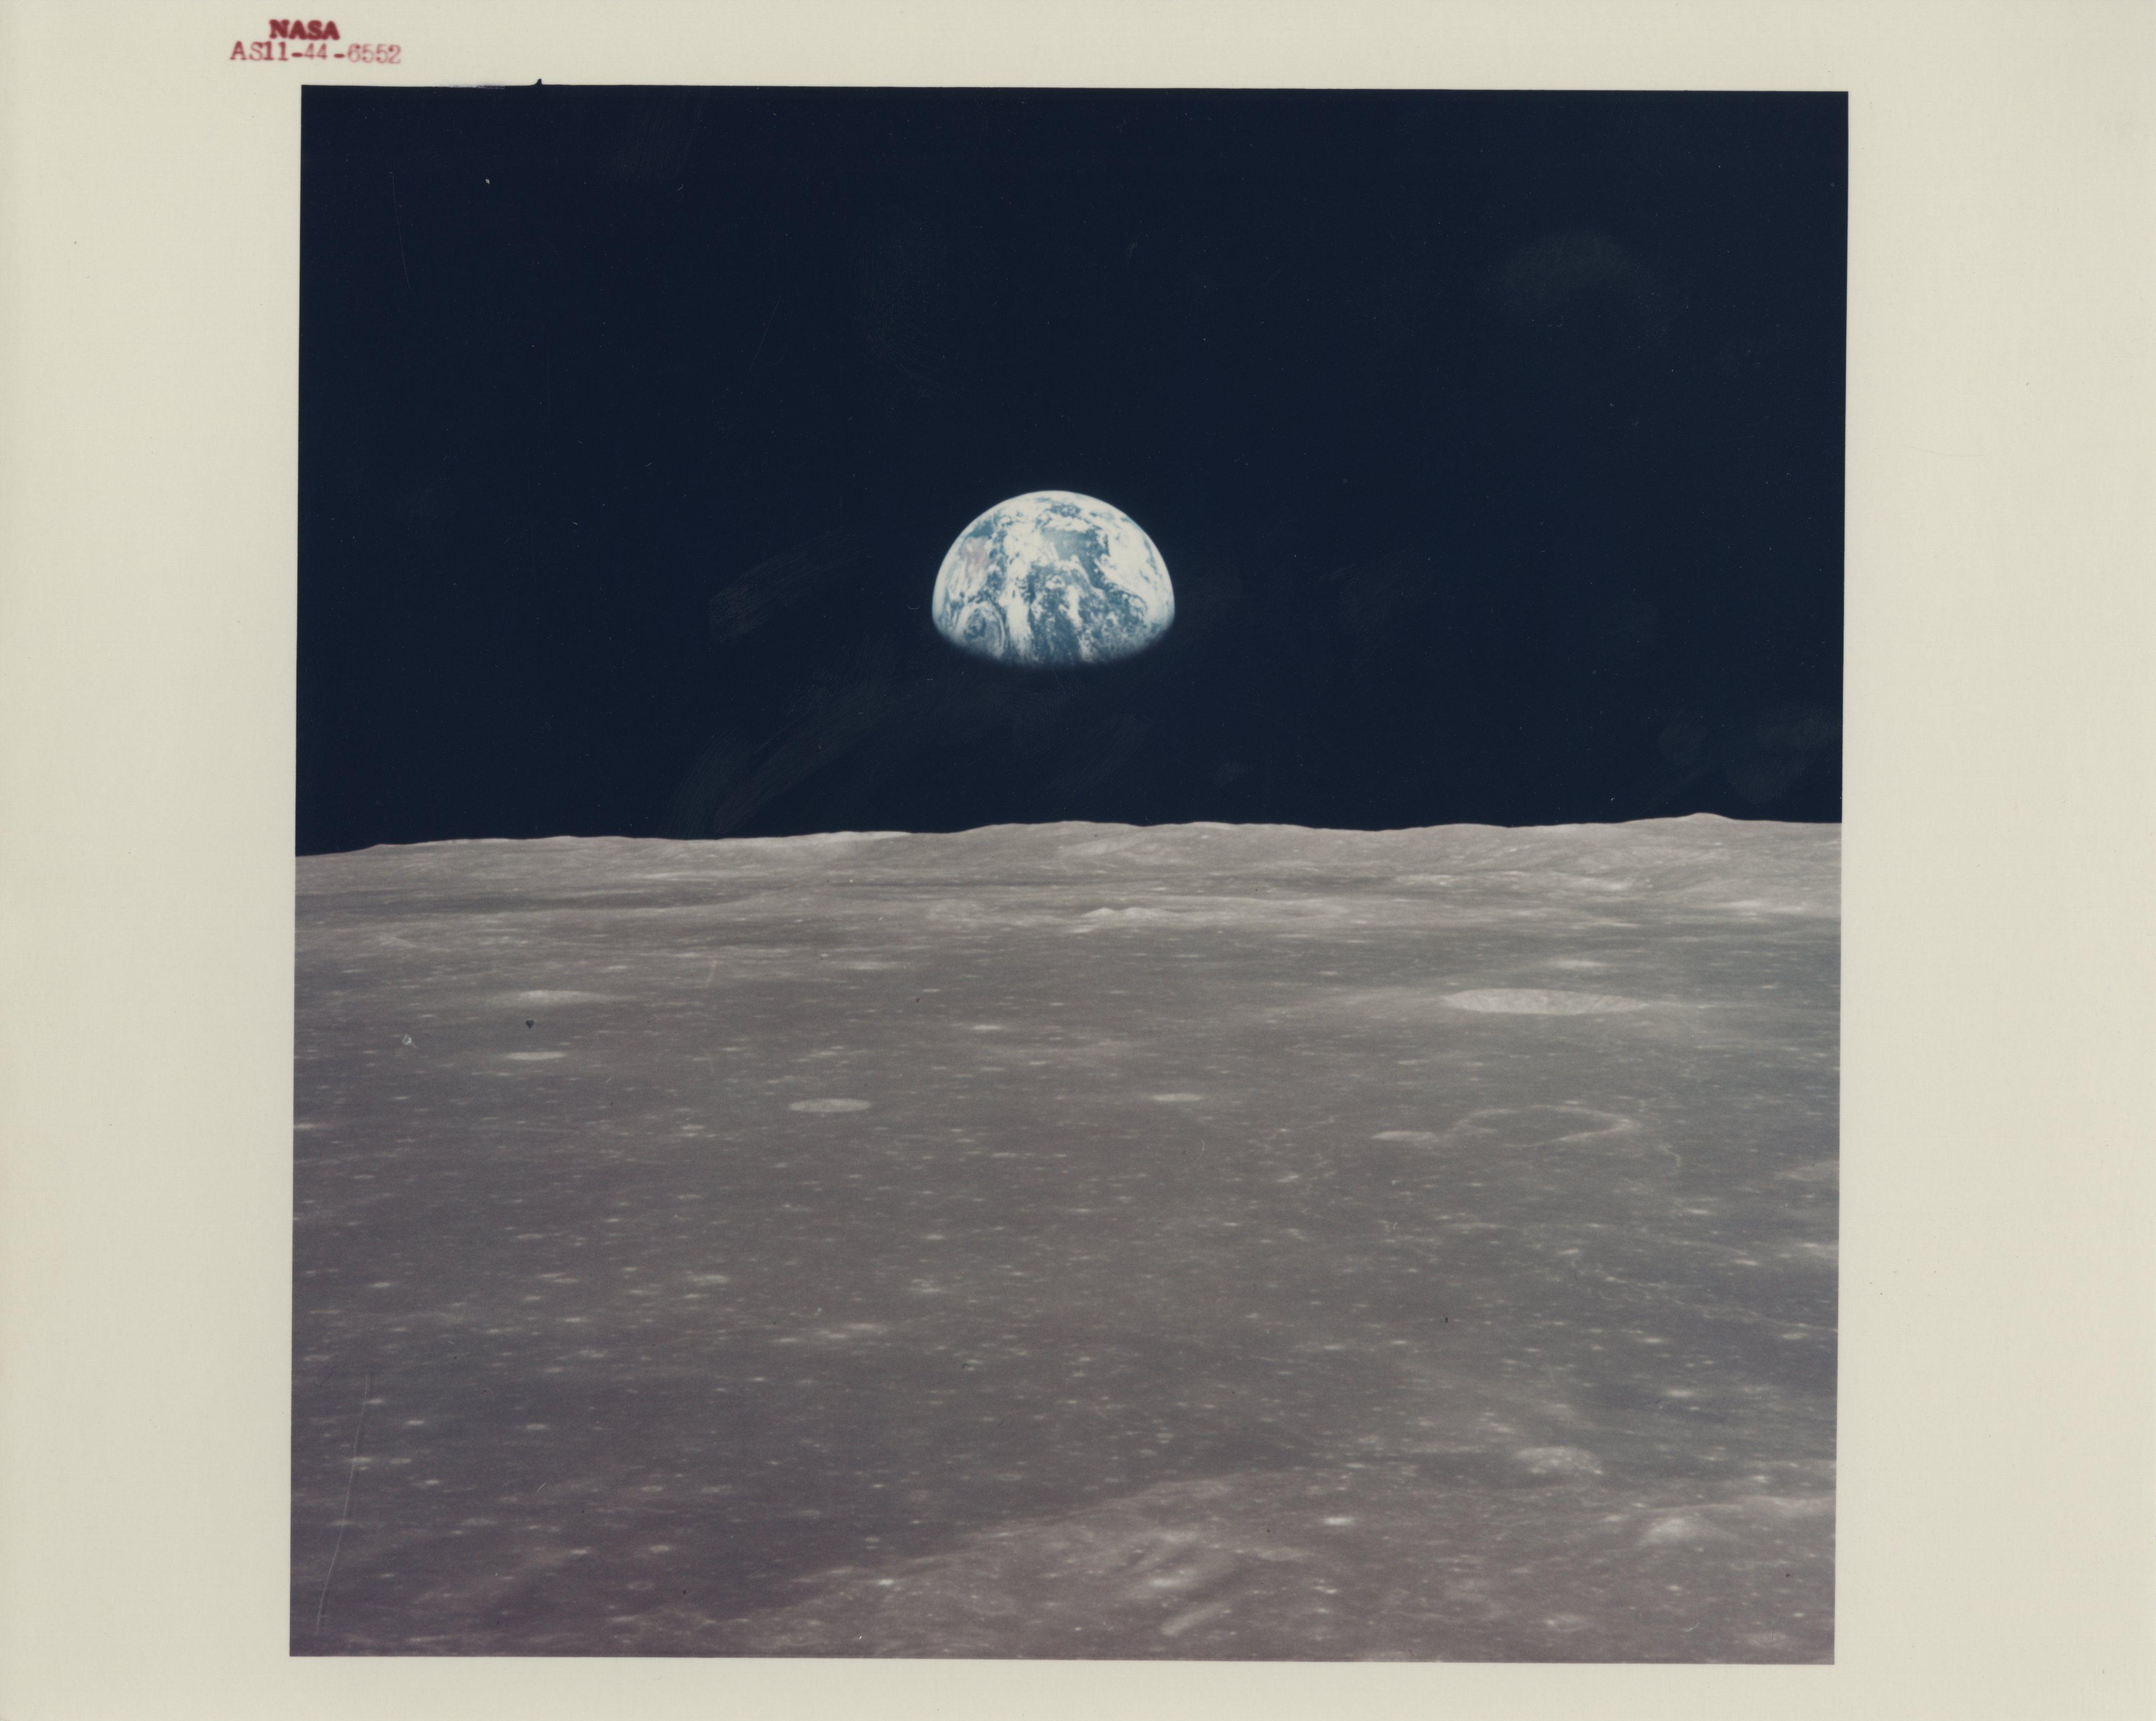 lunarlandingphoto003